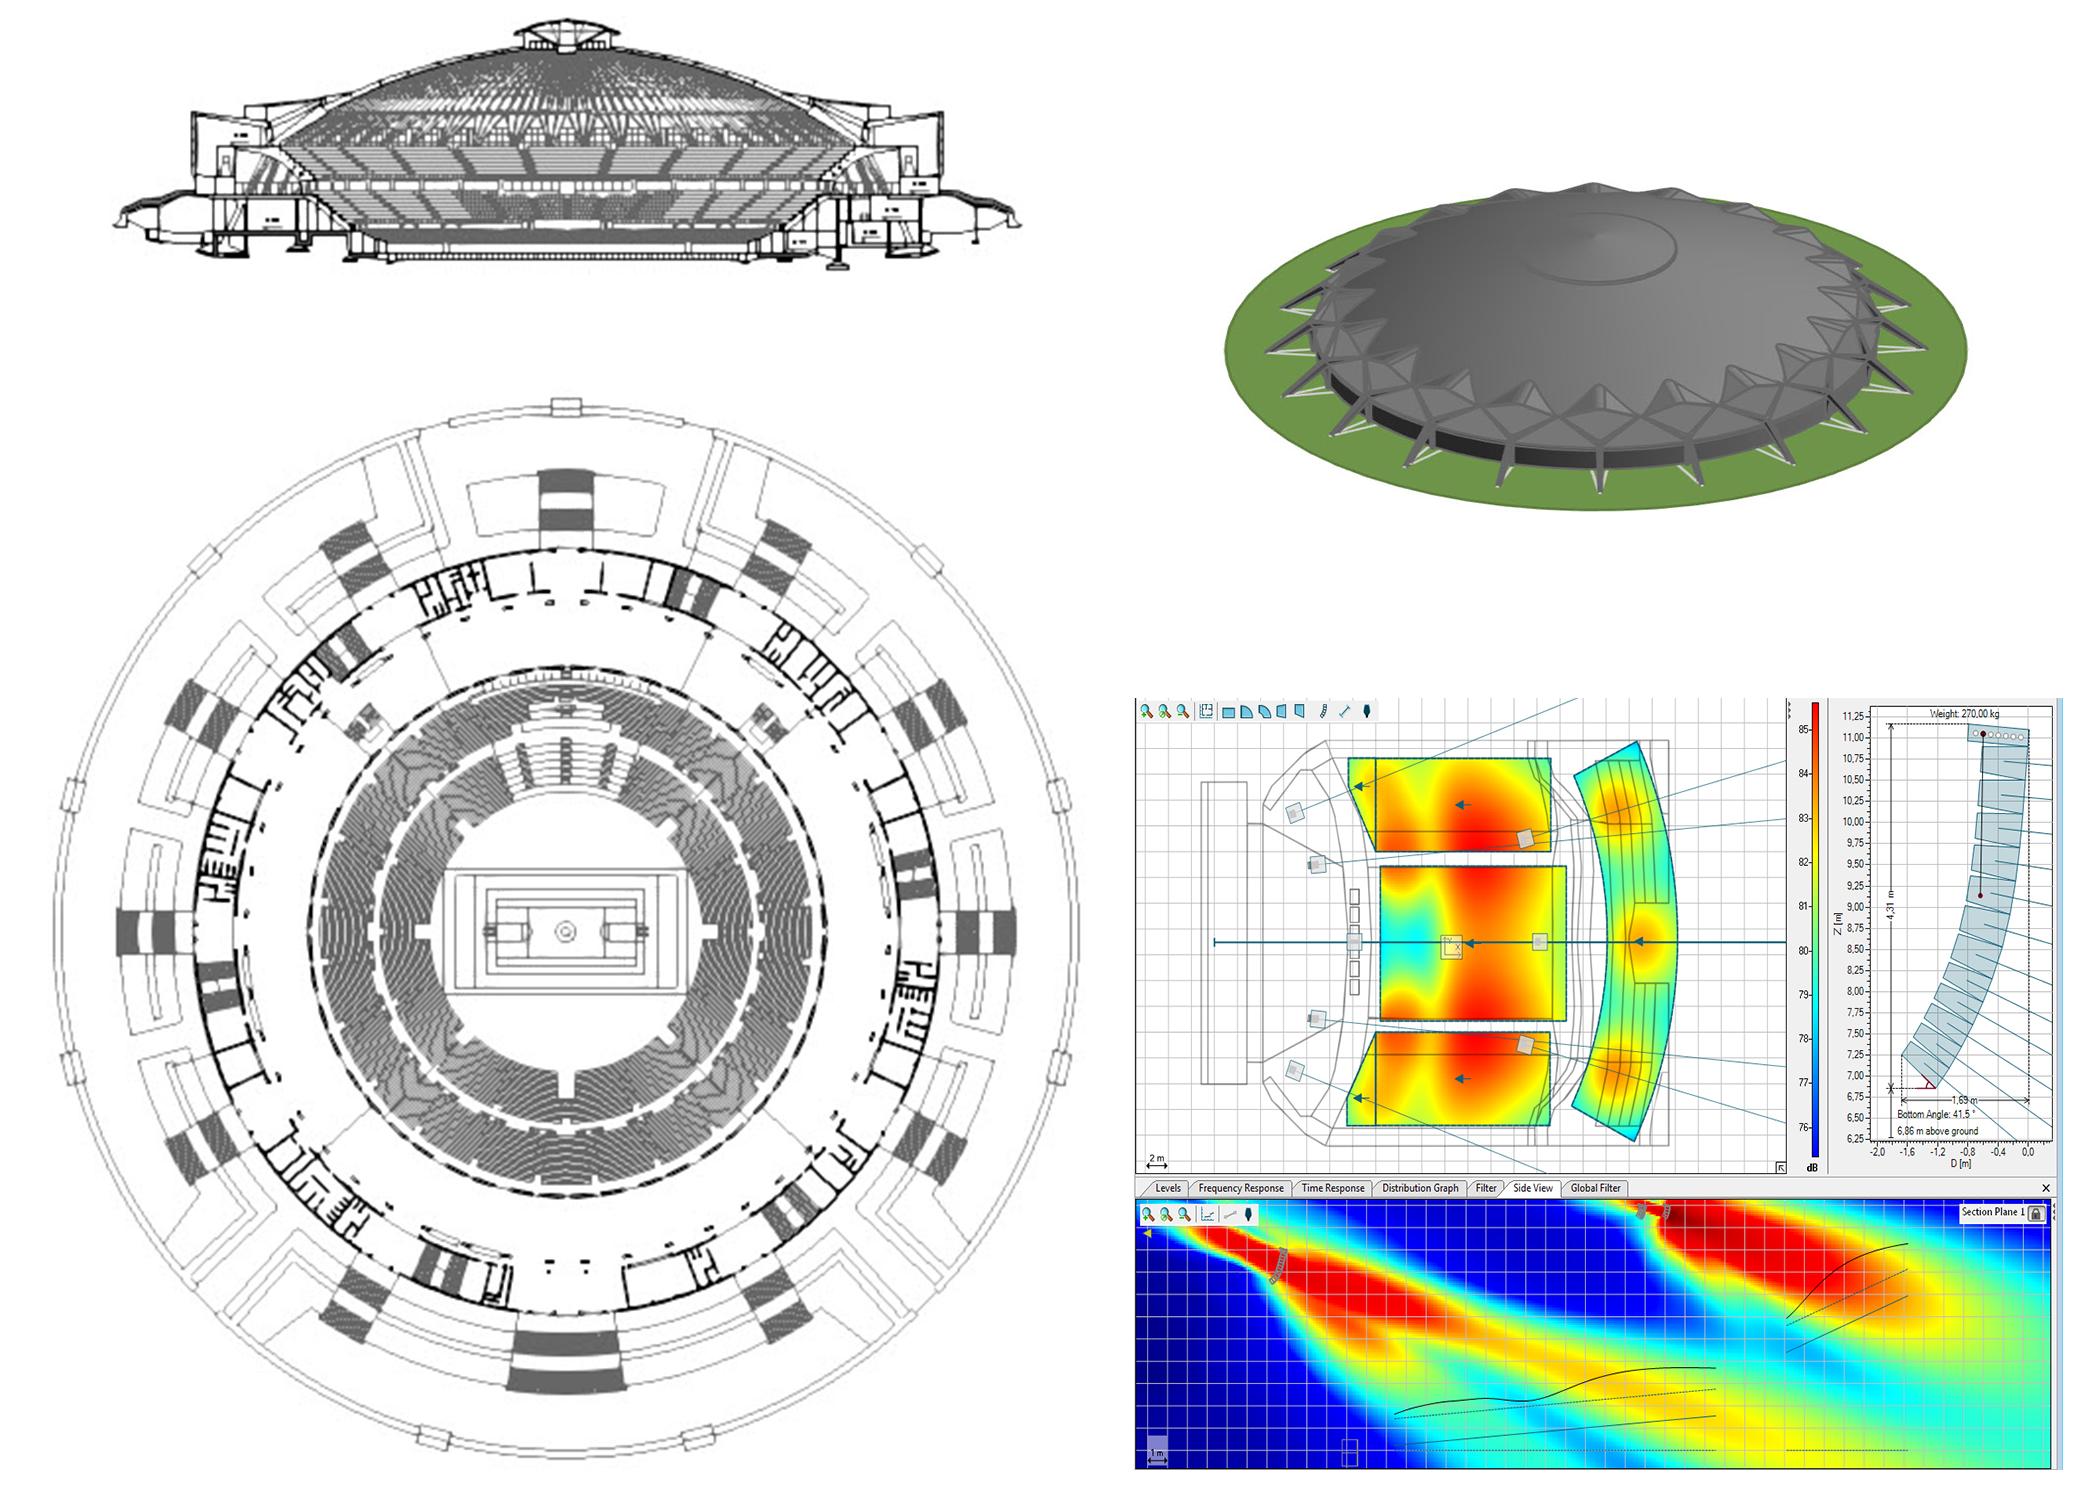 Schema Collegamento Xlr : Cavi audio analogici u2013 ii u2013 davide ruiba u2013 technical audio blog u2013